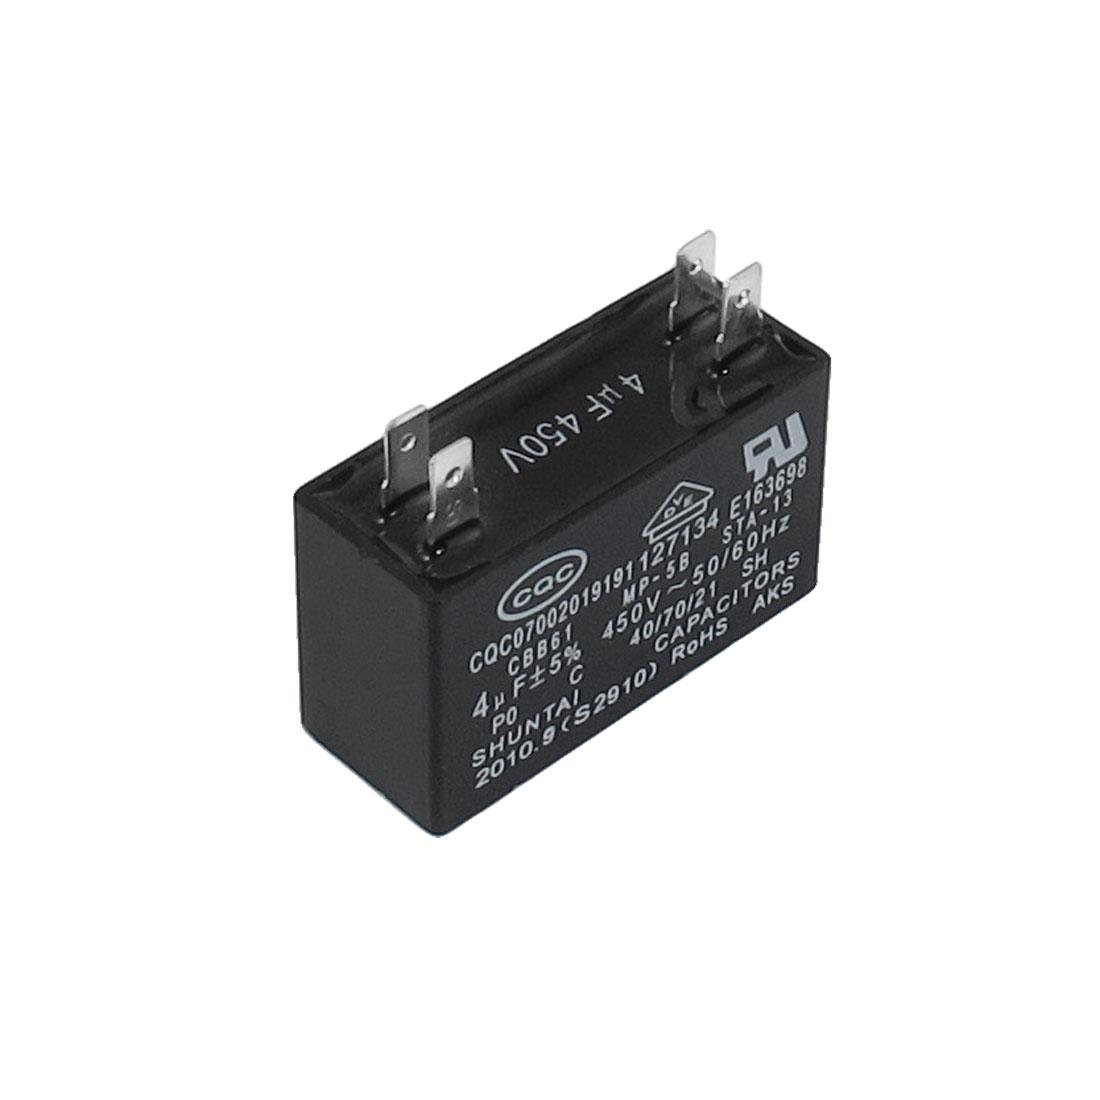 Polypropylene Film AC Motor Run Capacitor 4 Terminals 4uF 5% 450V CBB61